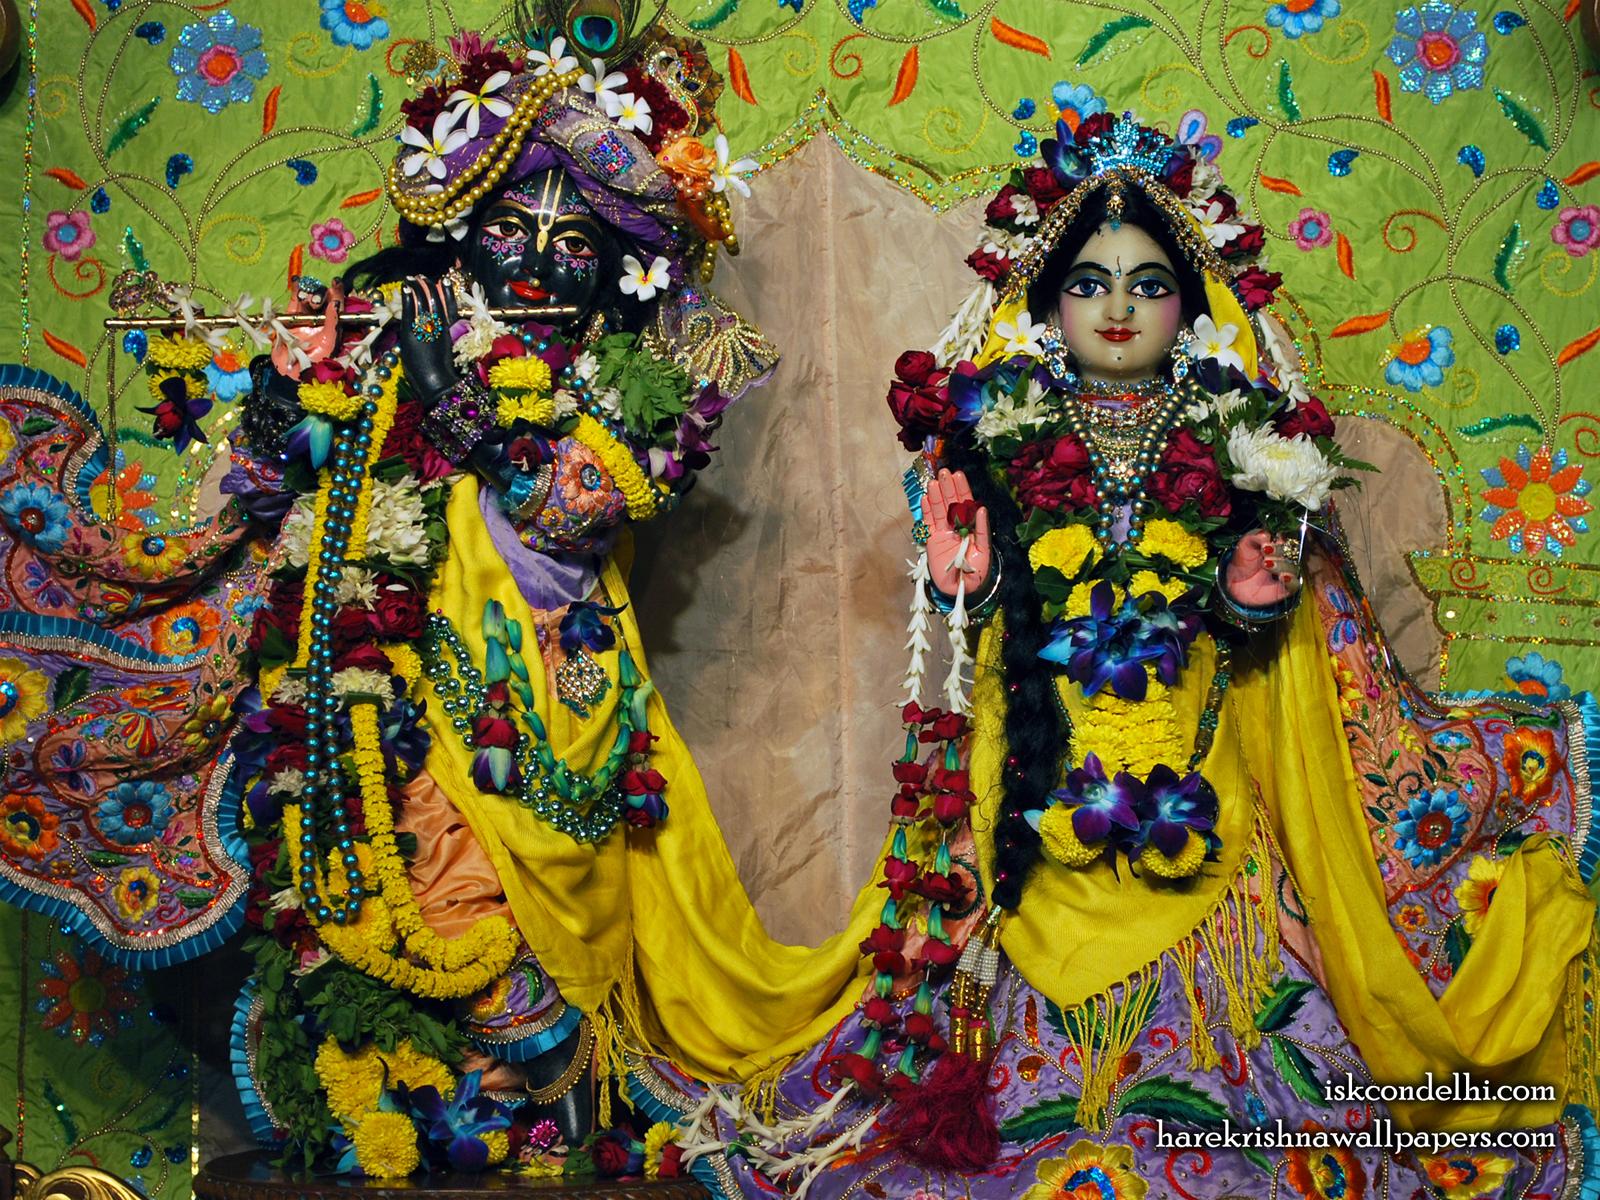 Sri Sri Radha Parthasarathi Wallpaper (008) Size1600x1200 Download